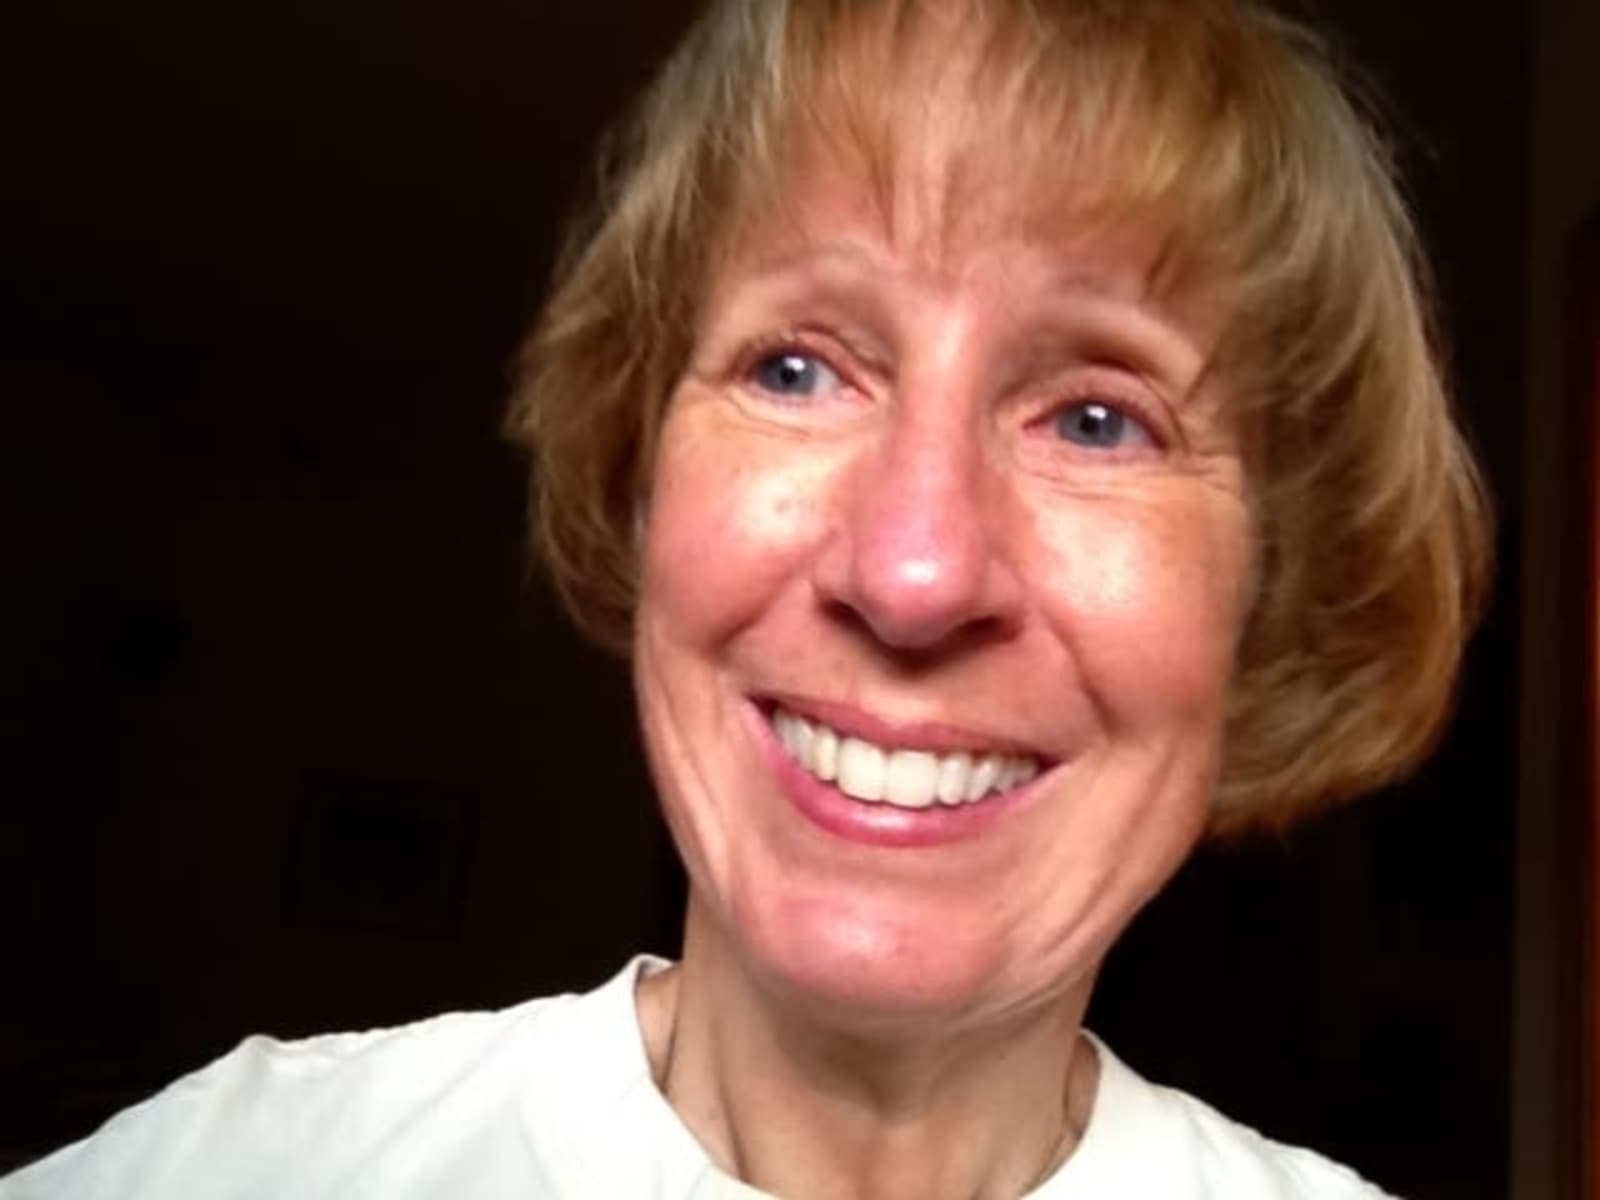 Karen from Woodinville, Washington, United States